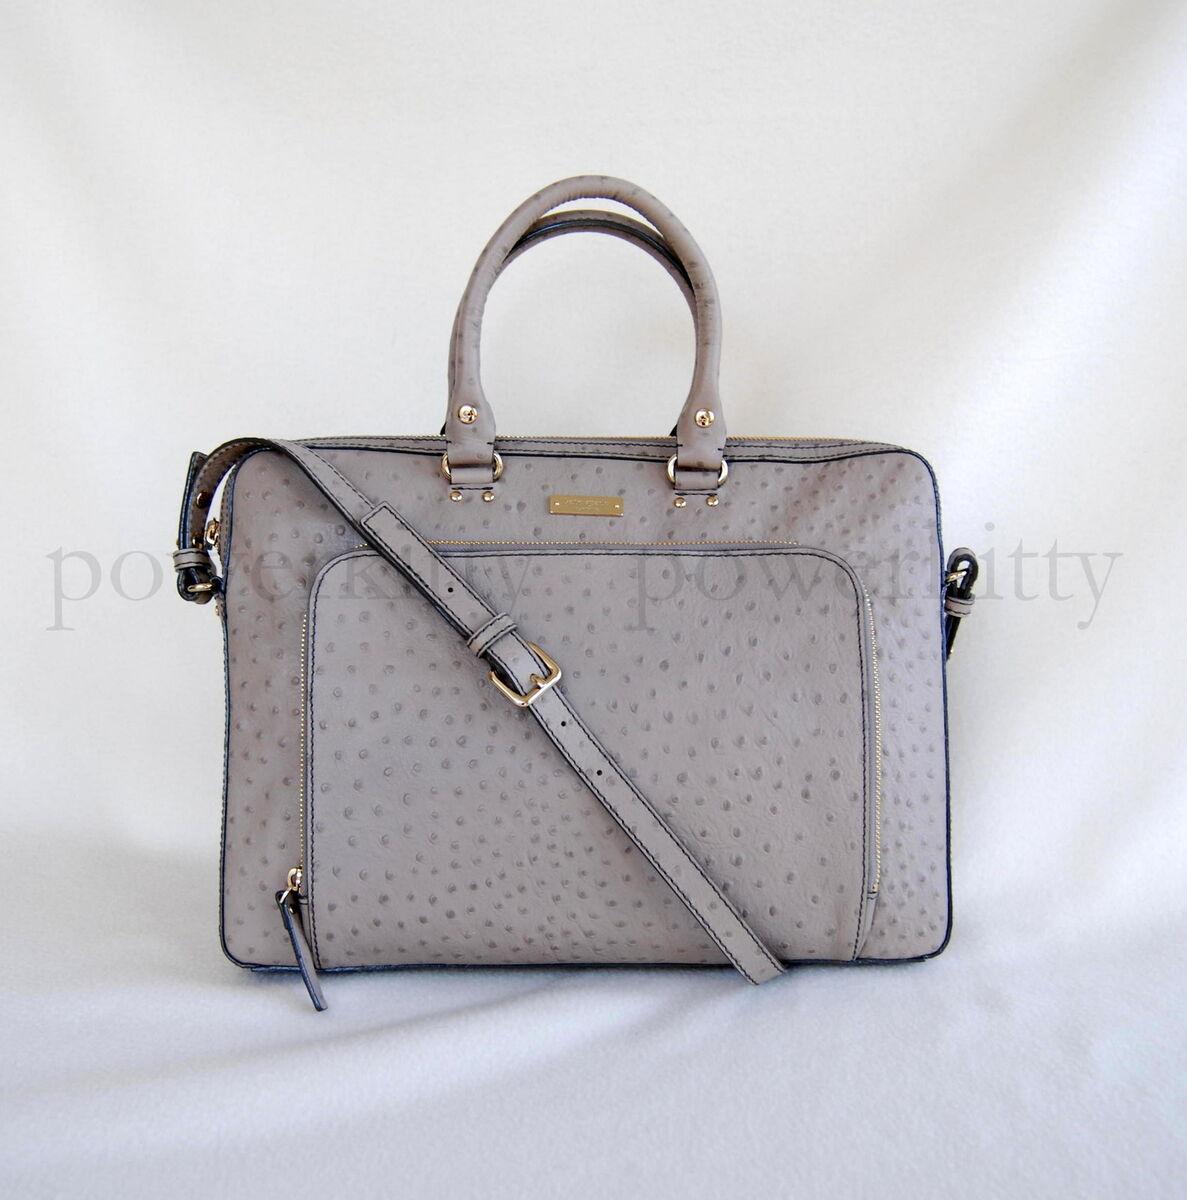 New $498 Kate Spade Portola Valley Janine Laptop Case Bag Busines Tote